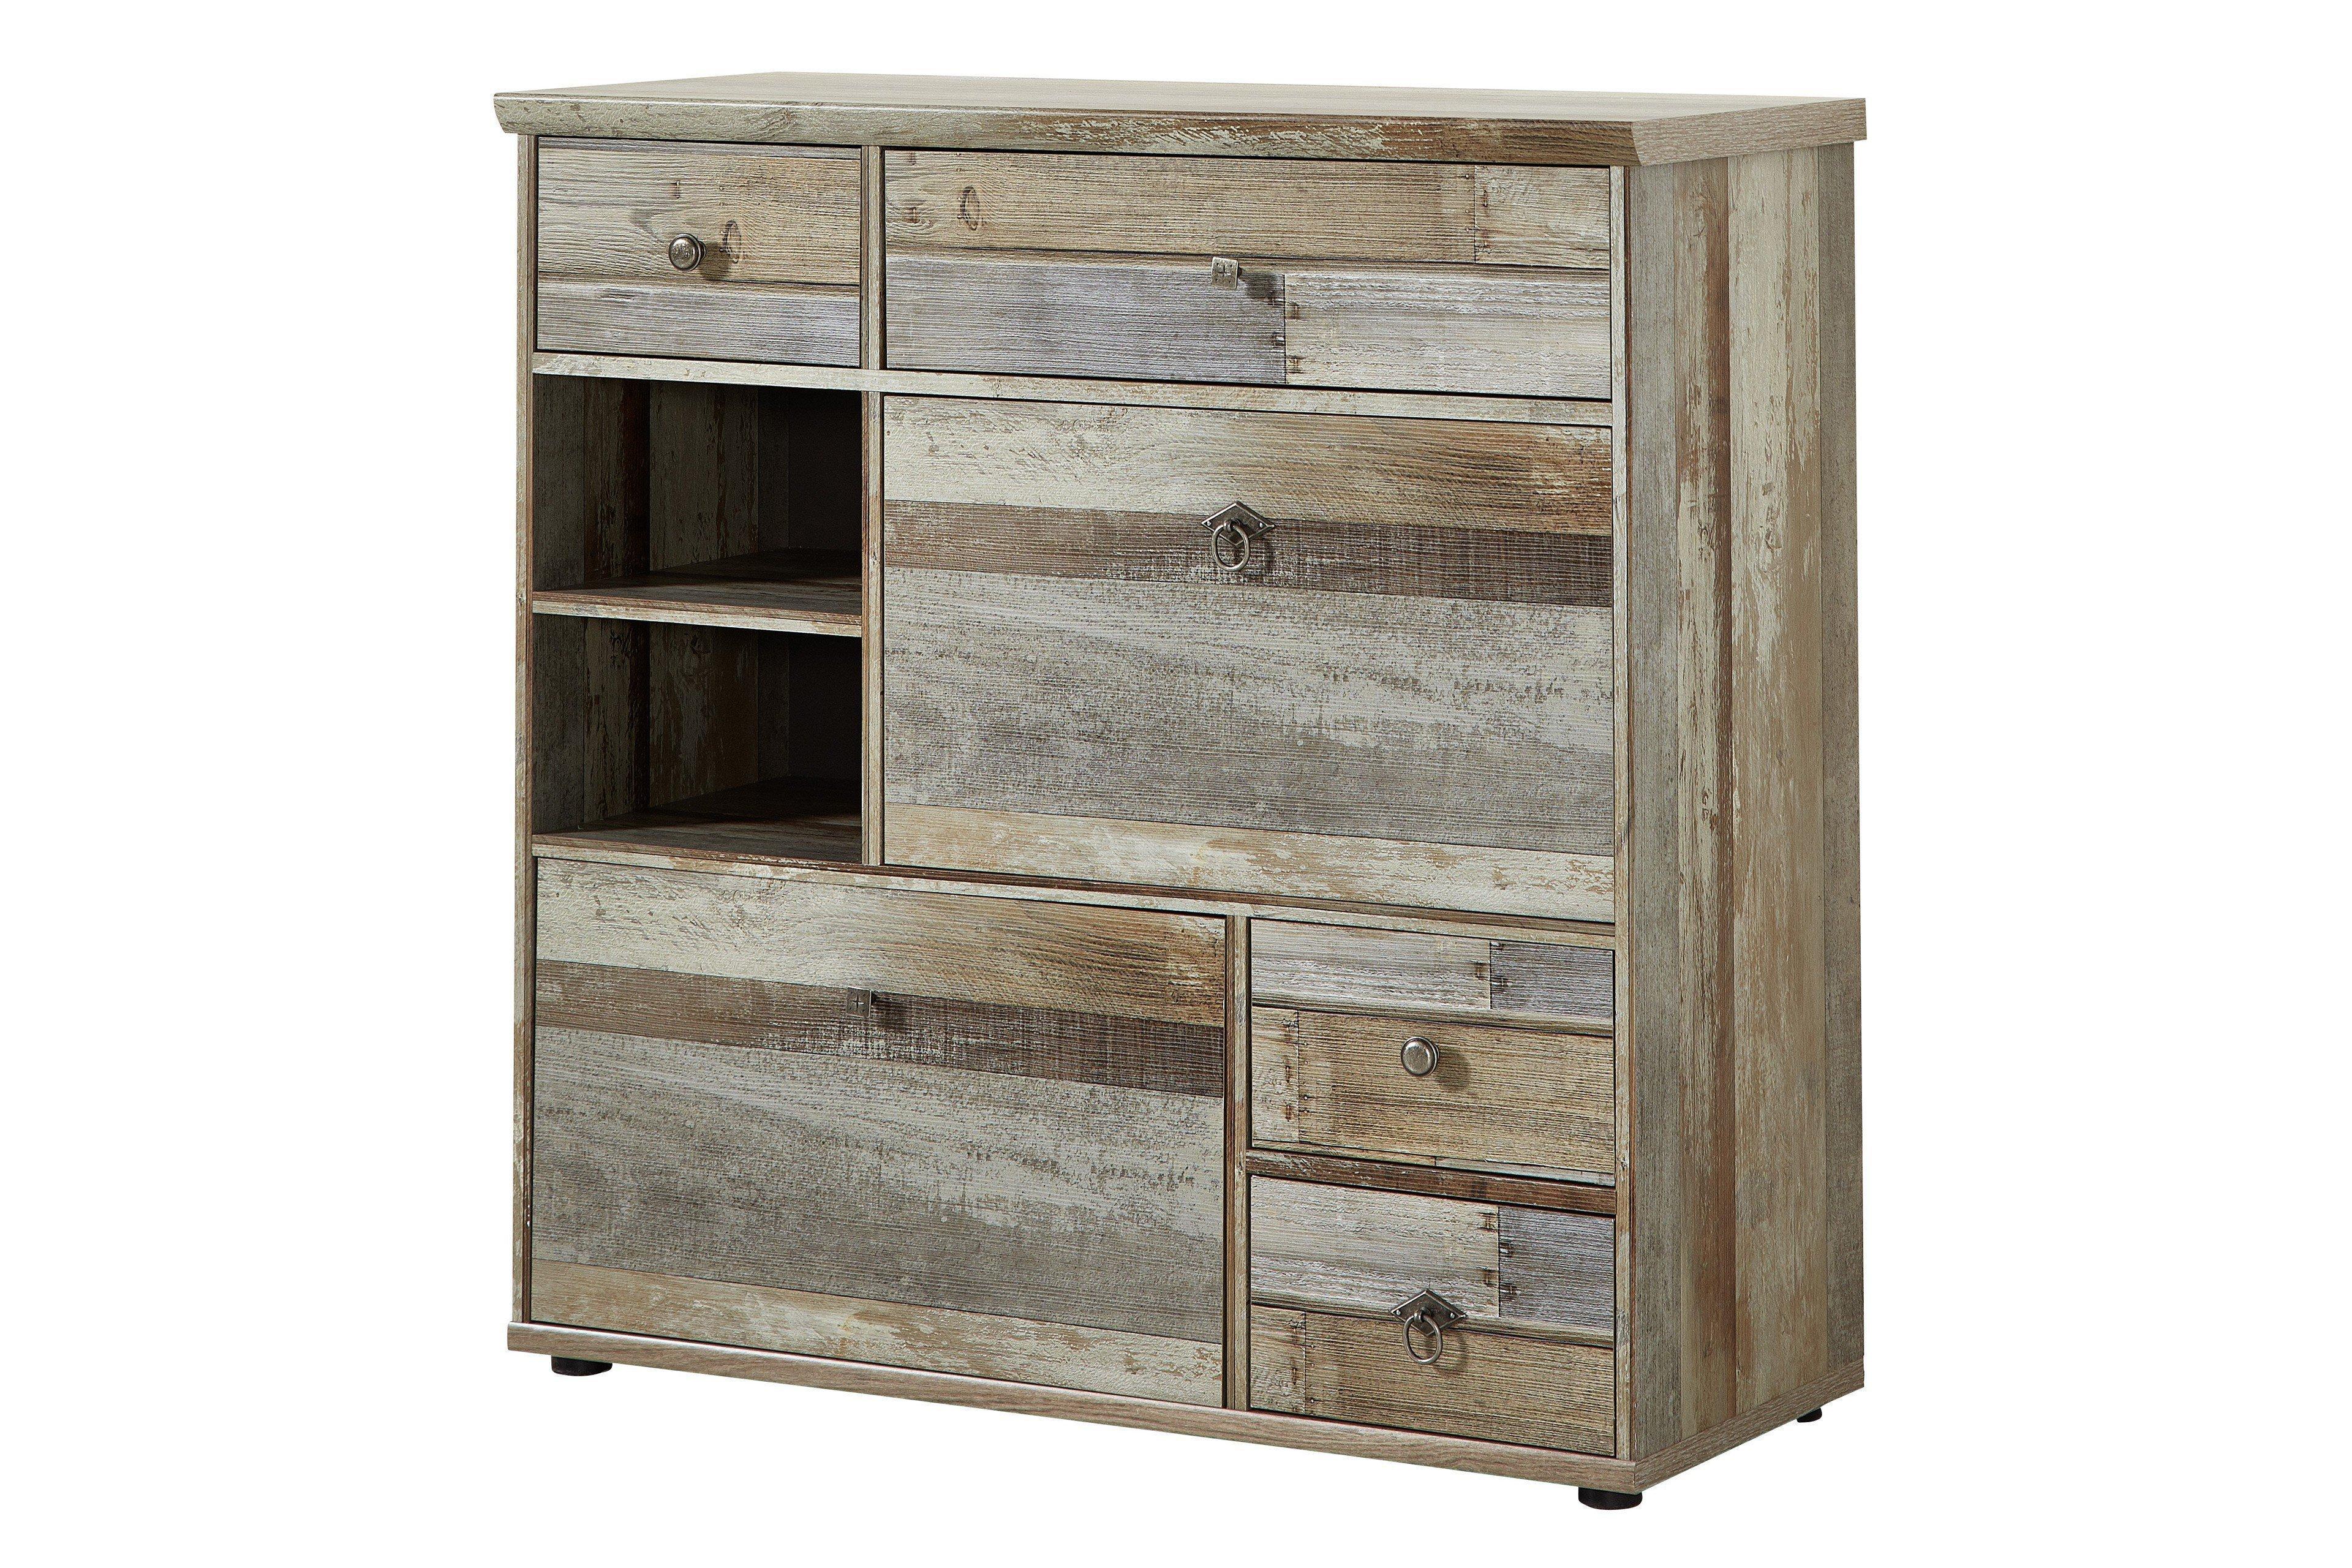 gro artig individuelle schuhschr nke ideen die kinderzimmer design ideen. Black Bedroom Furniture Sets. Home Design Ideas